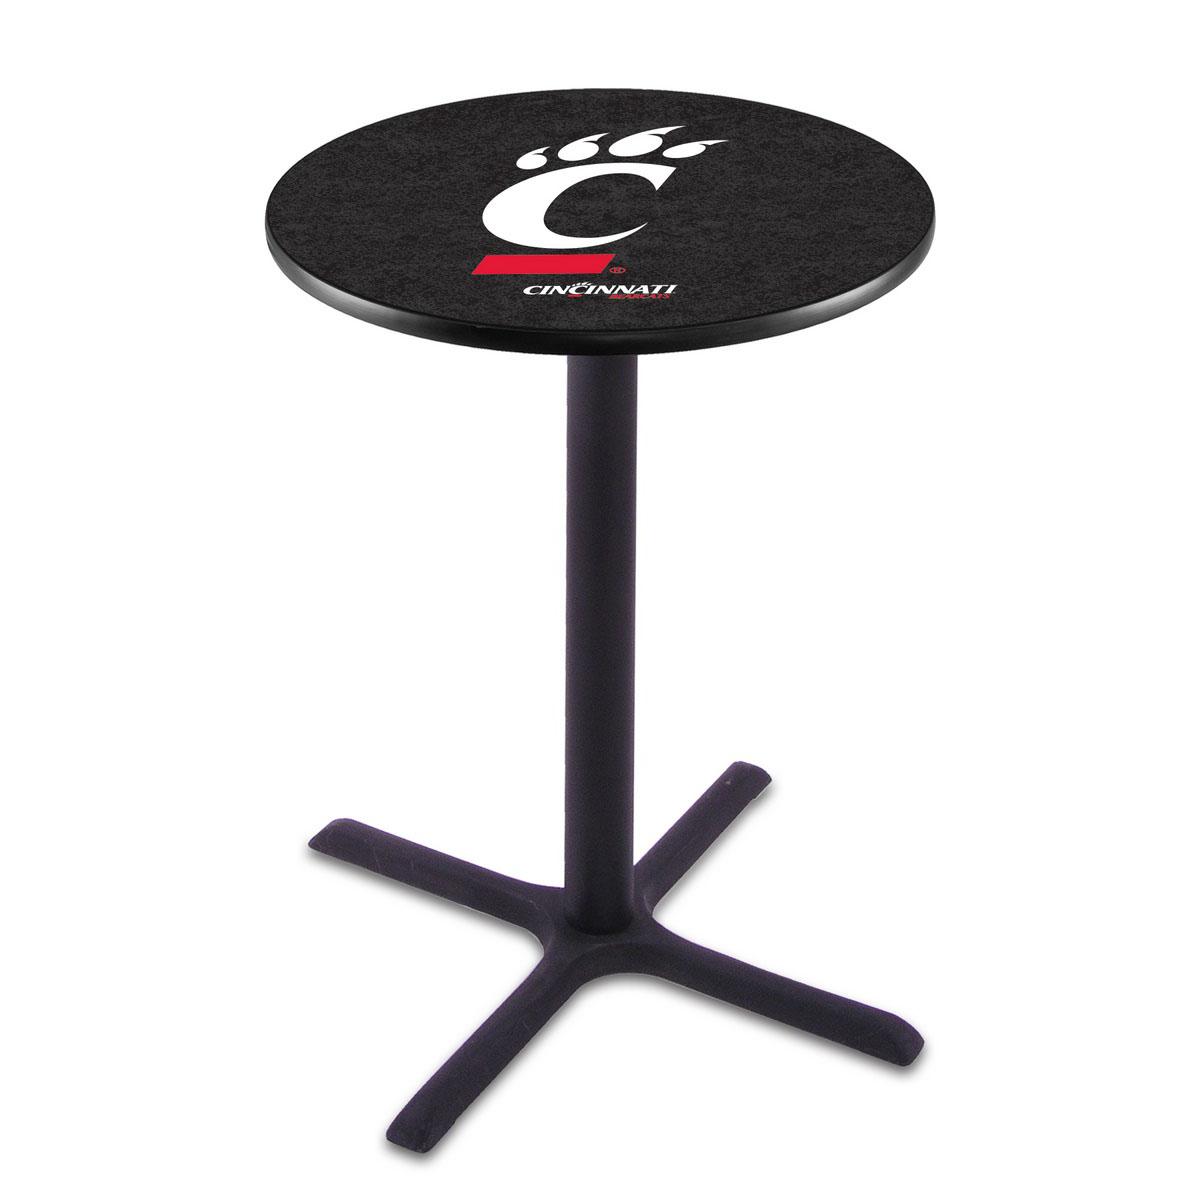 Select Cincinnati-Wrinkle-Pub-Table Product Picture 2134